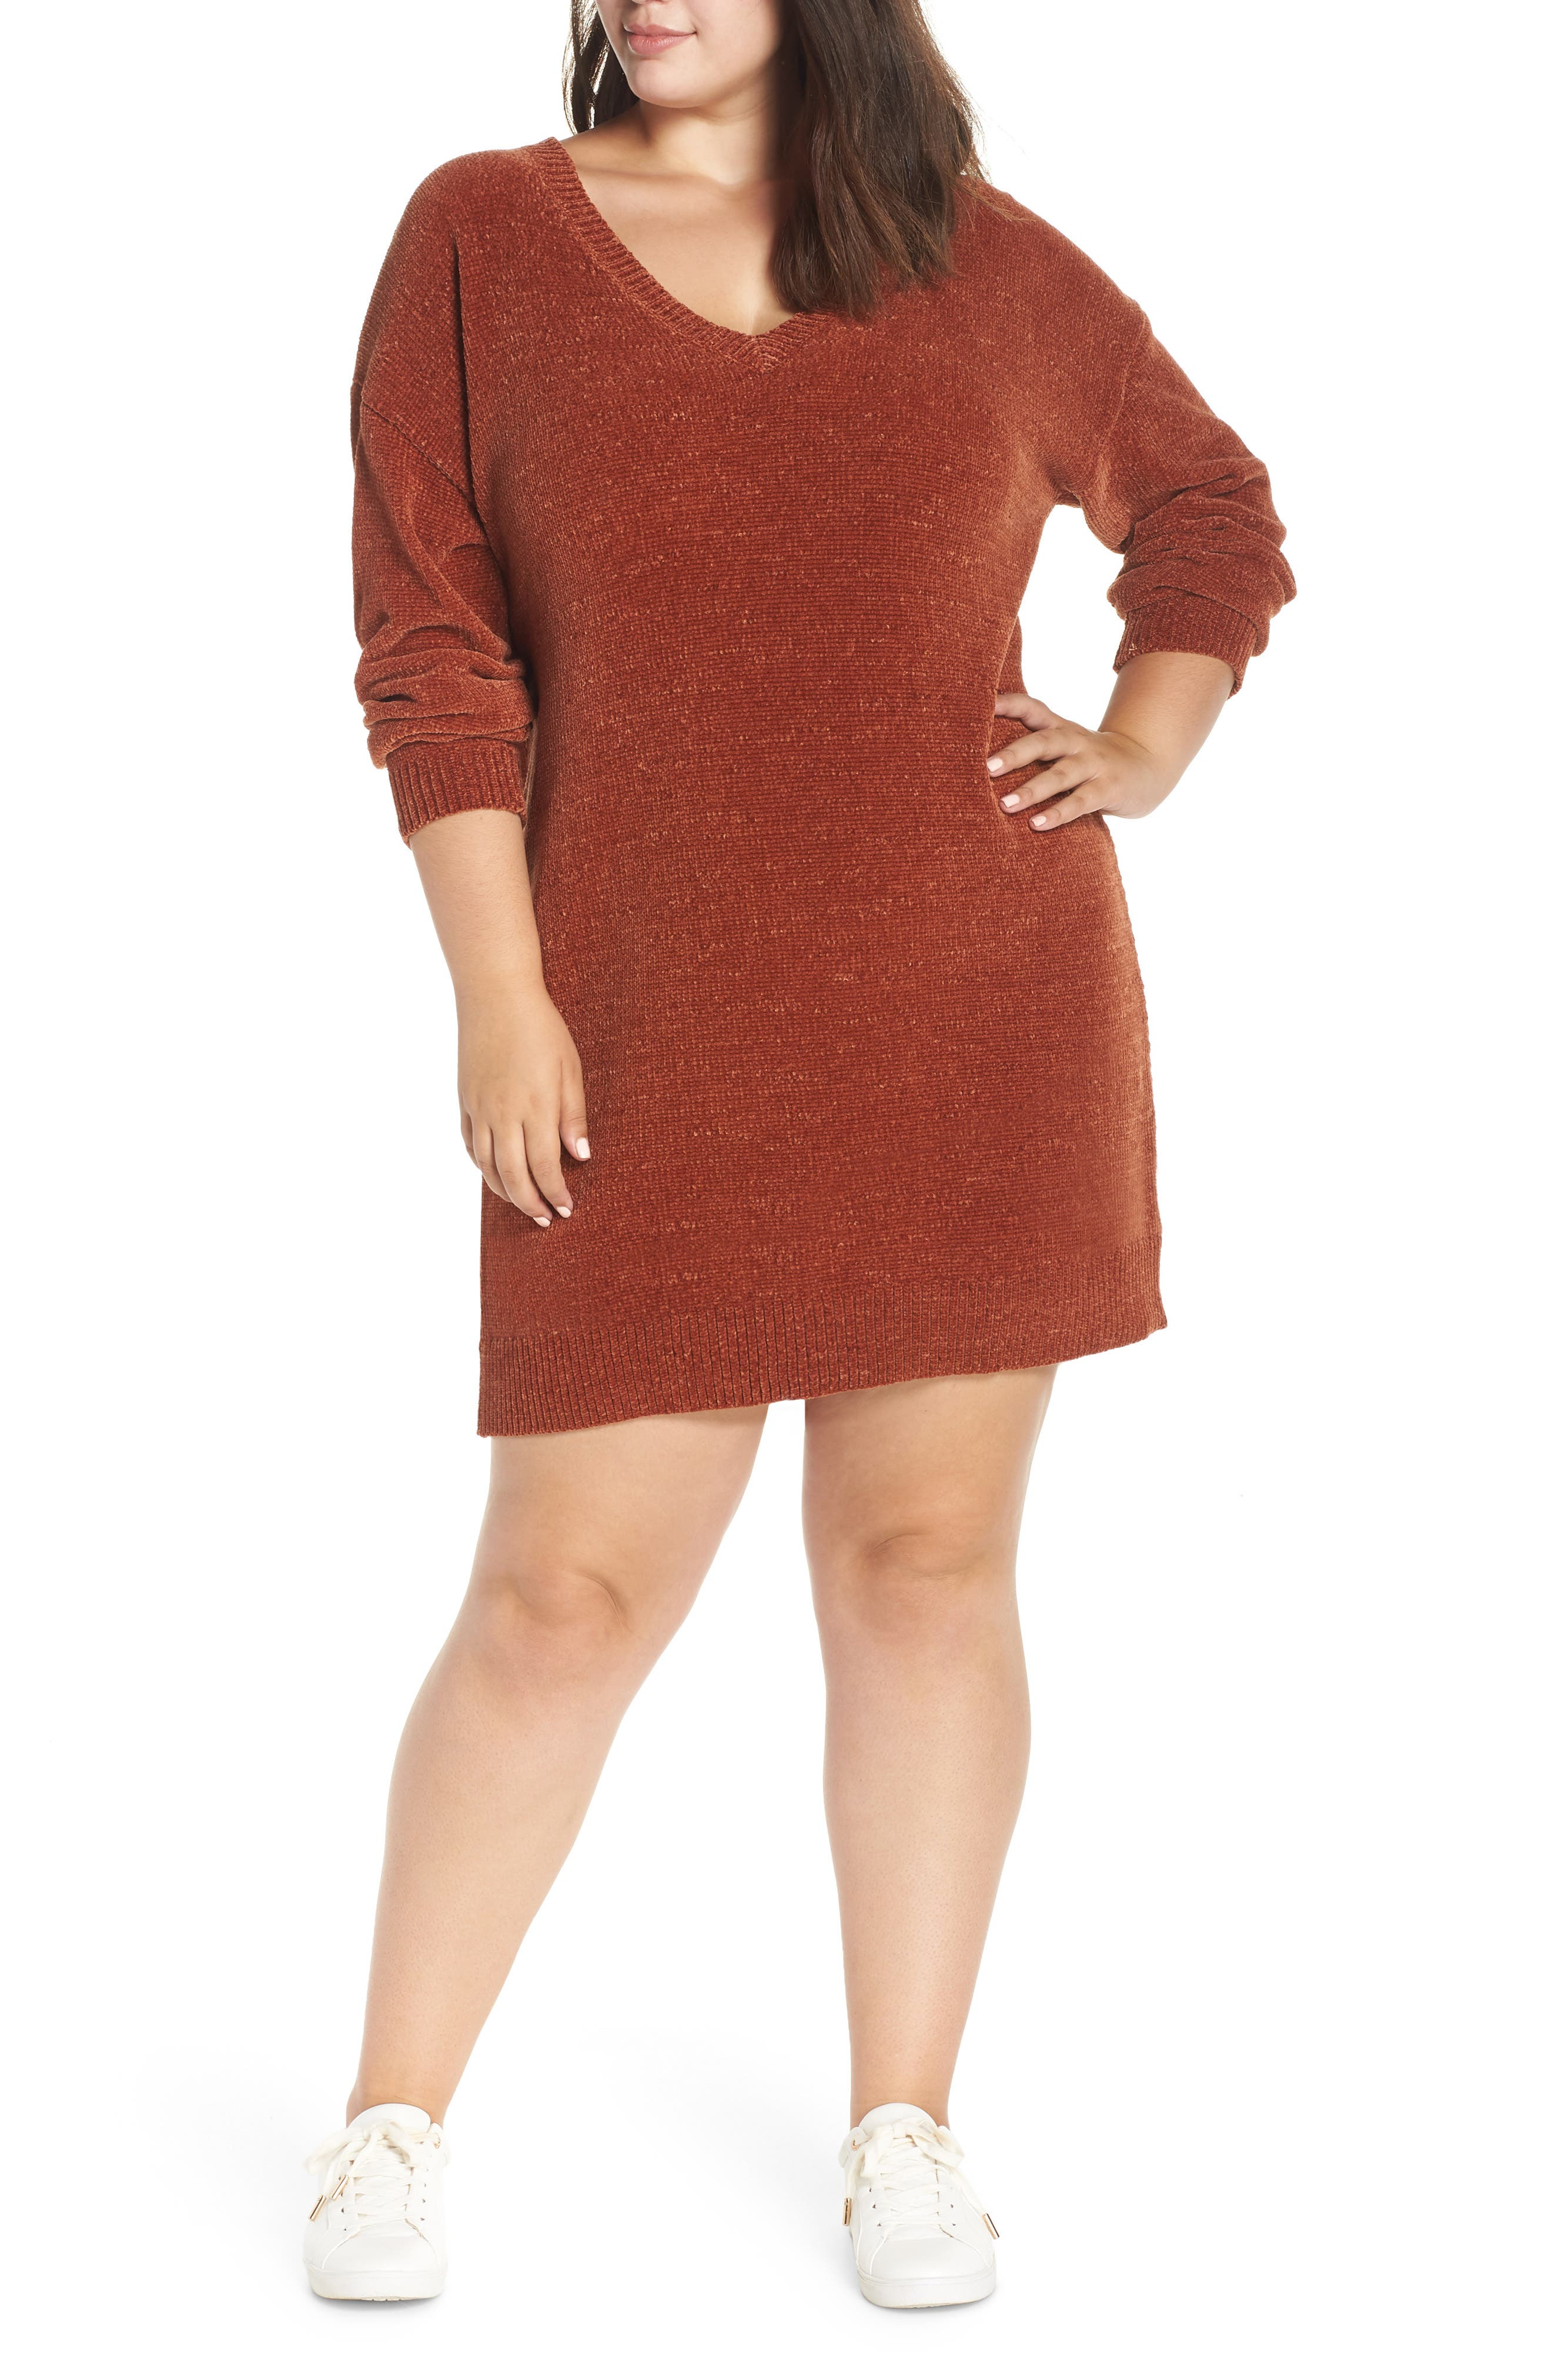 Chenille Sweater Dress,                             Main thumbnail 1, color,                             221